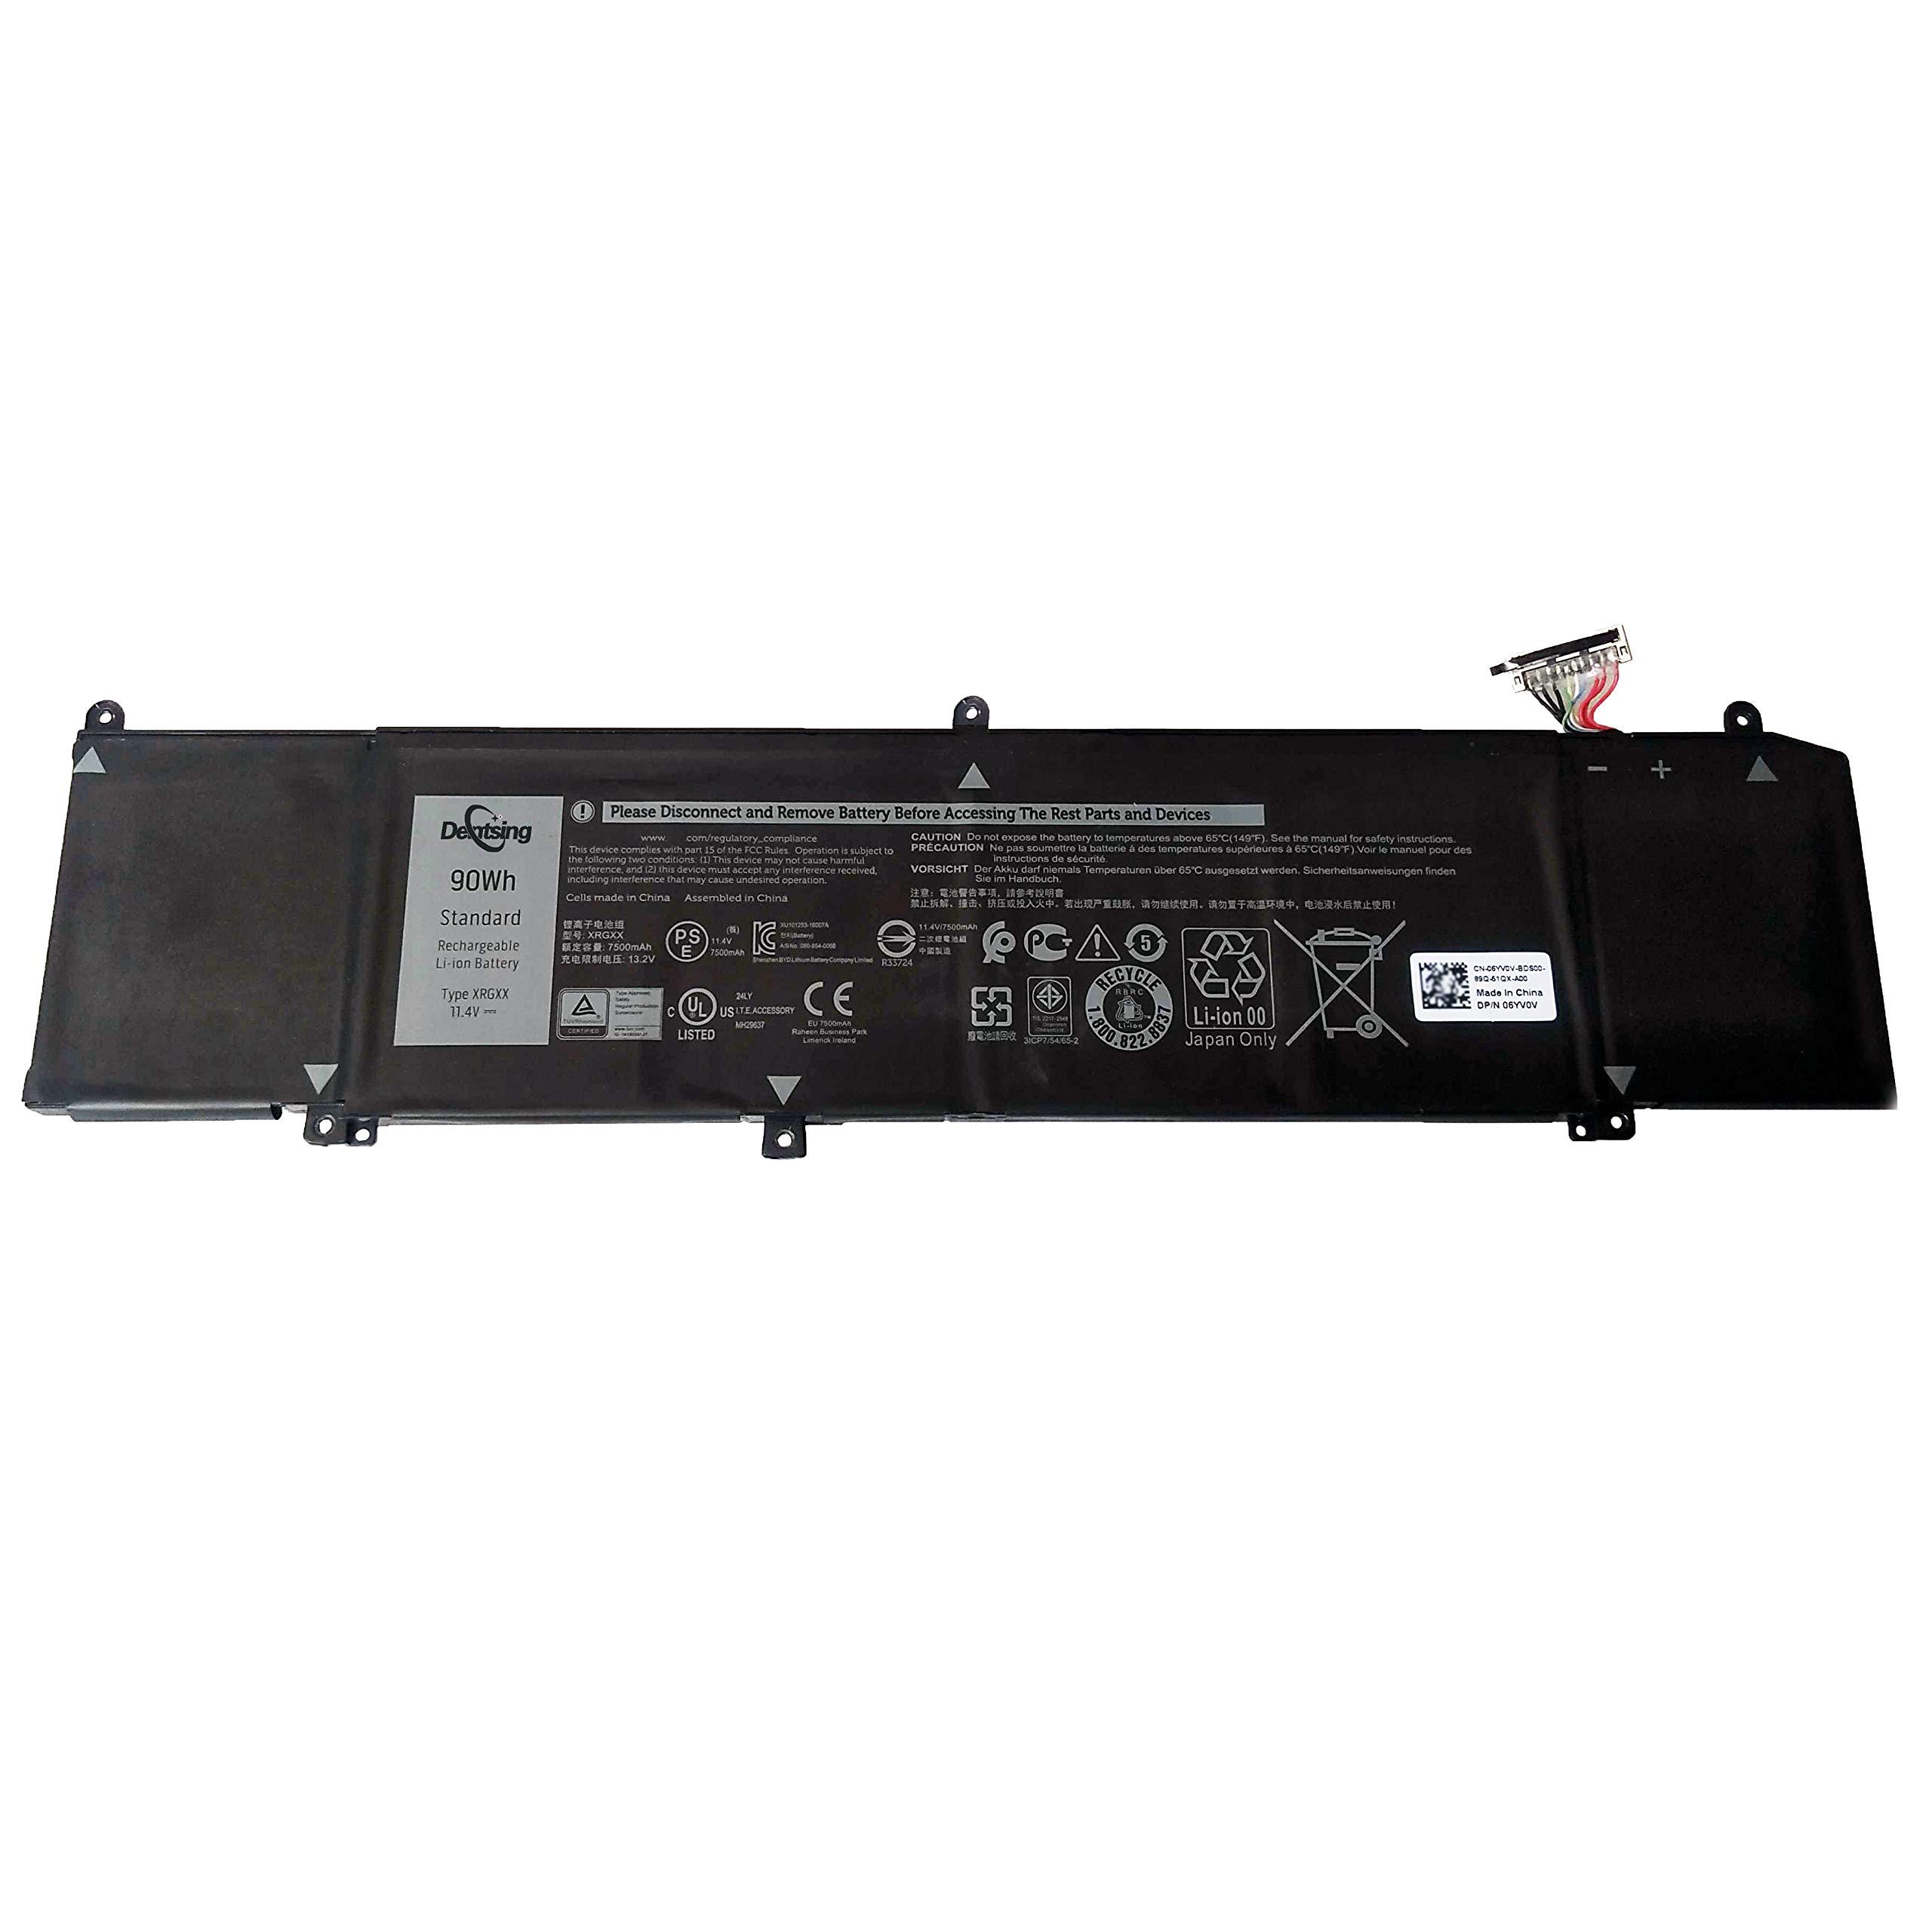 Bateria XRGXX para Dell G5 15 5590 G7 15 7590 G7 17 7790 Ali